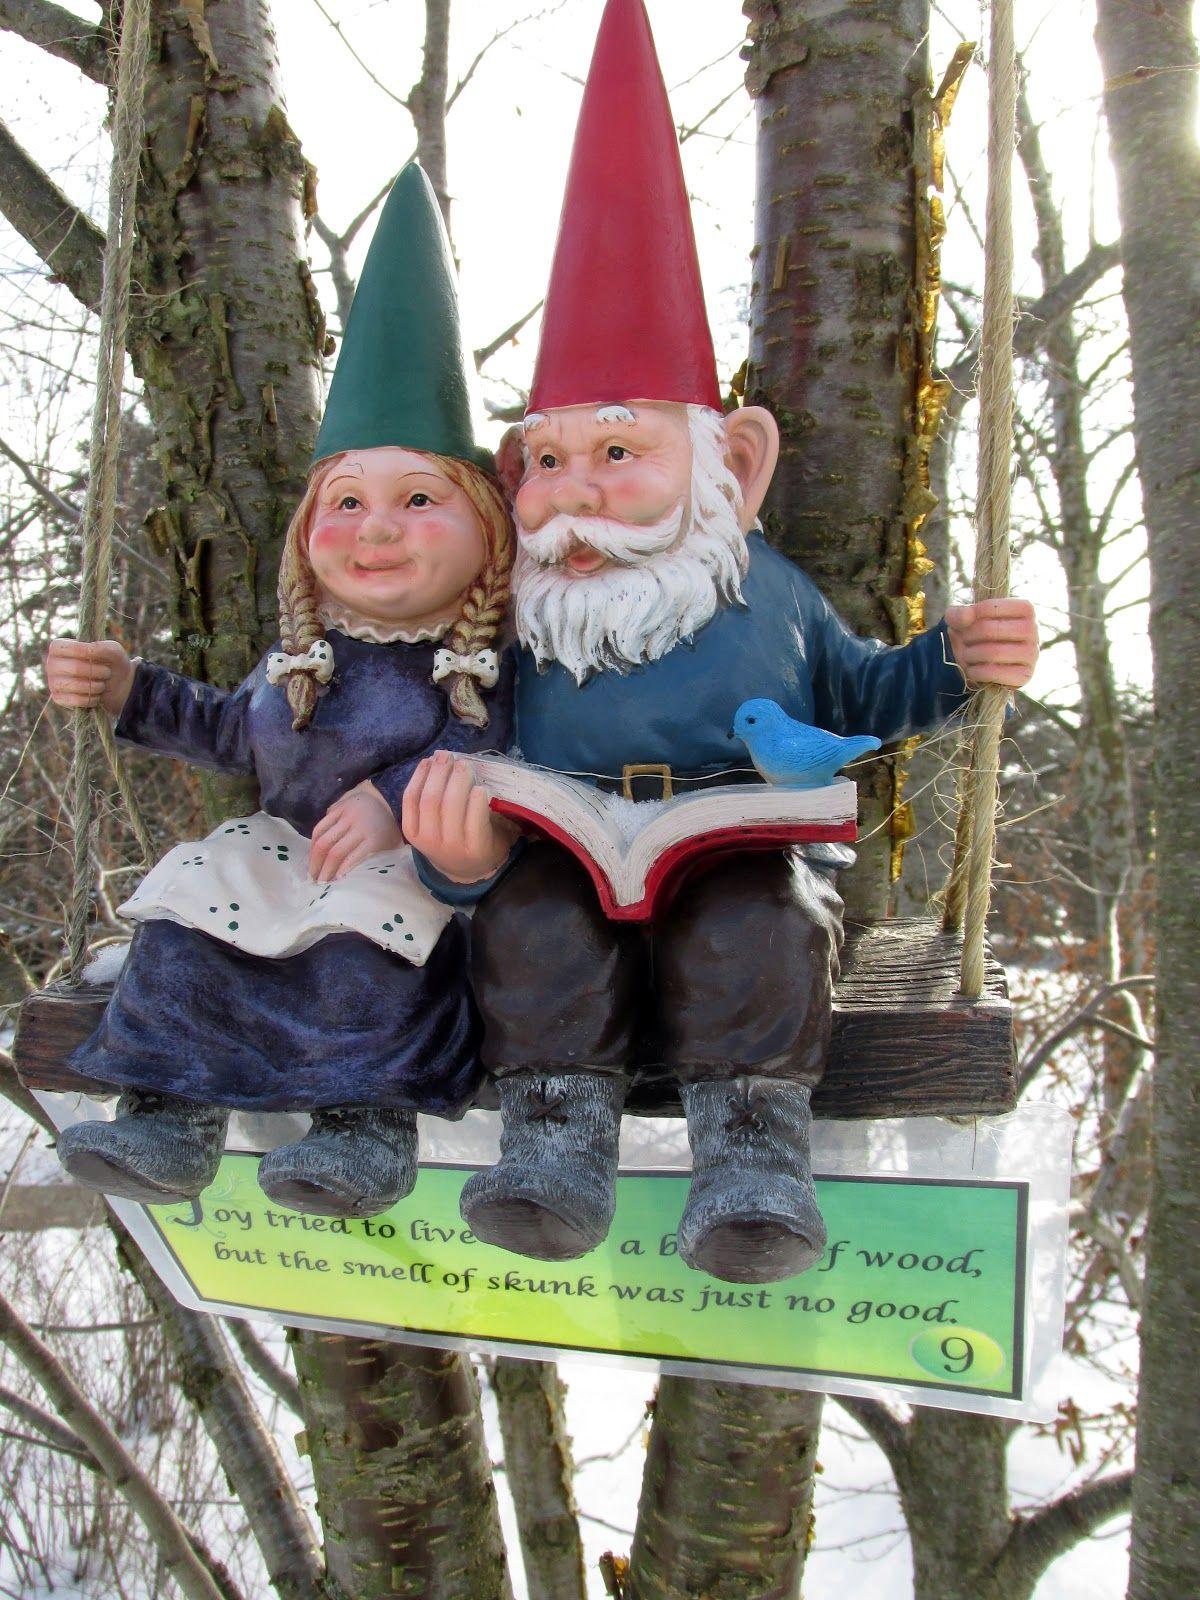 Gnome Garden: Gnomes, Gnome Garden, Gnome House